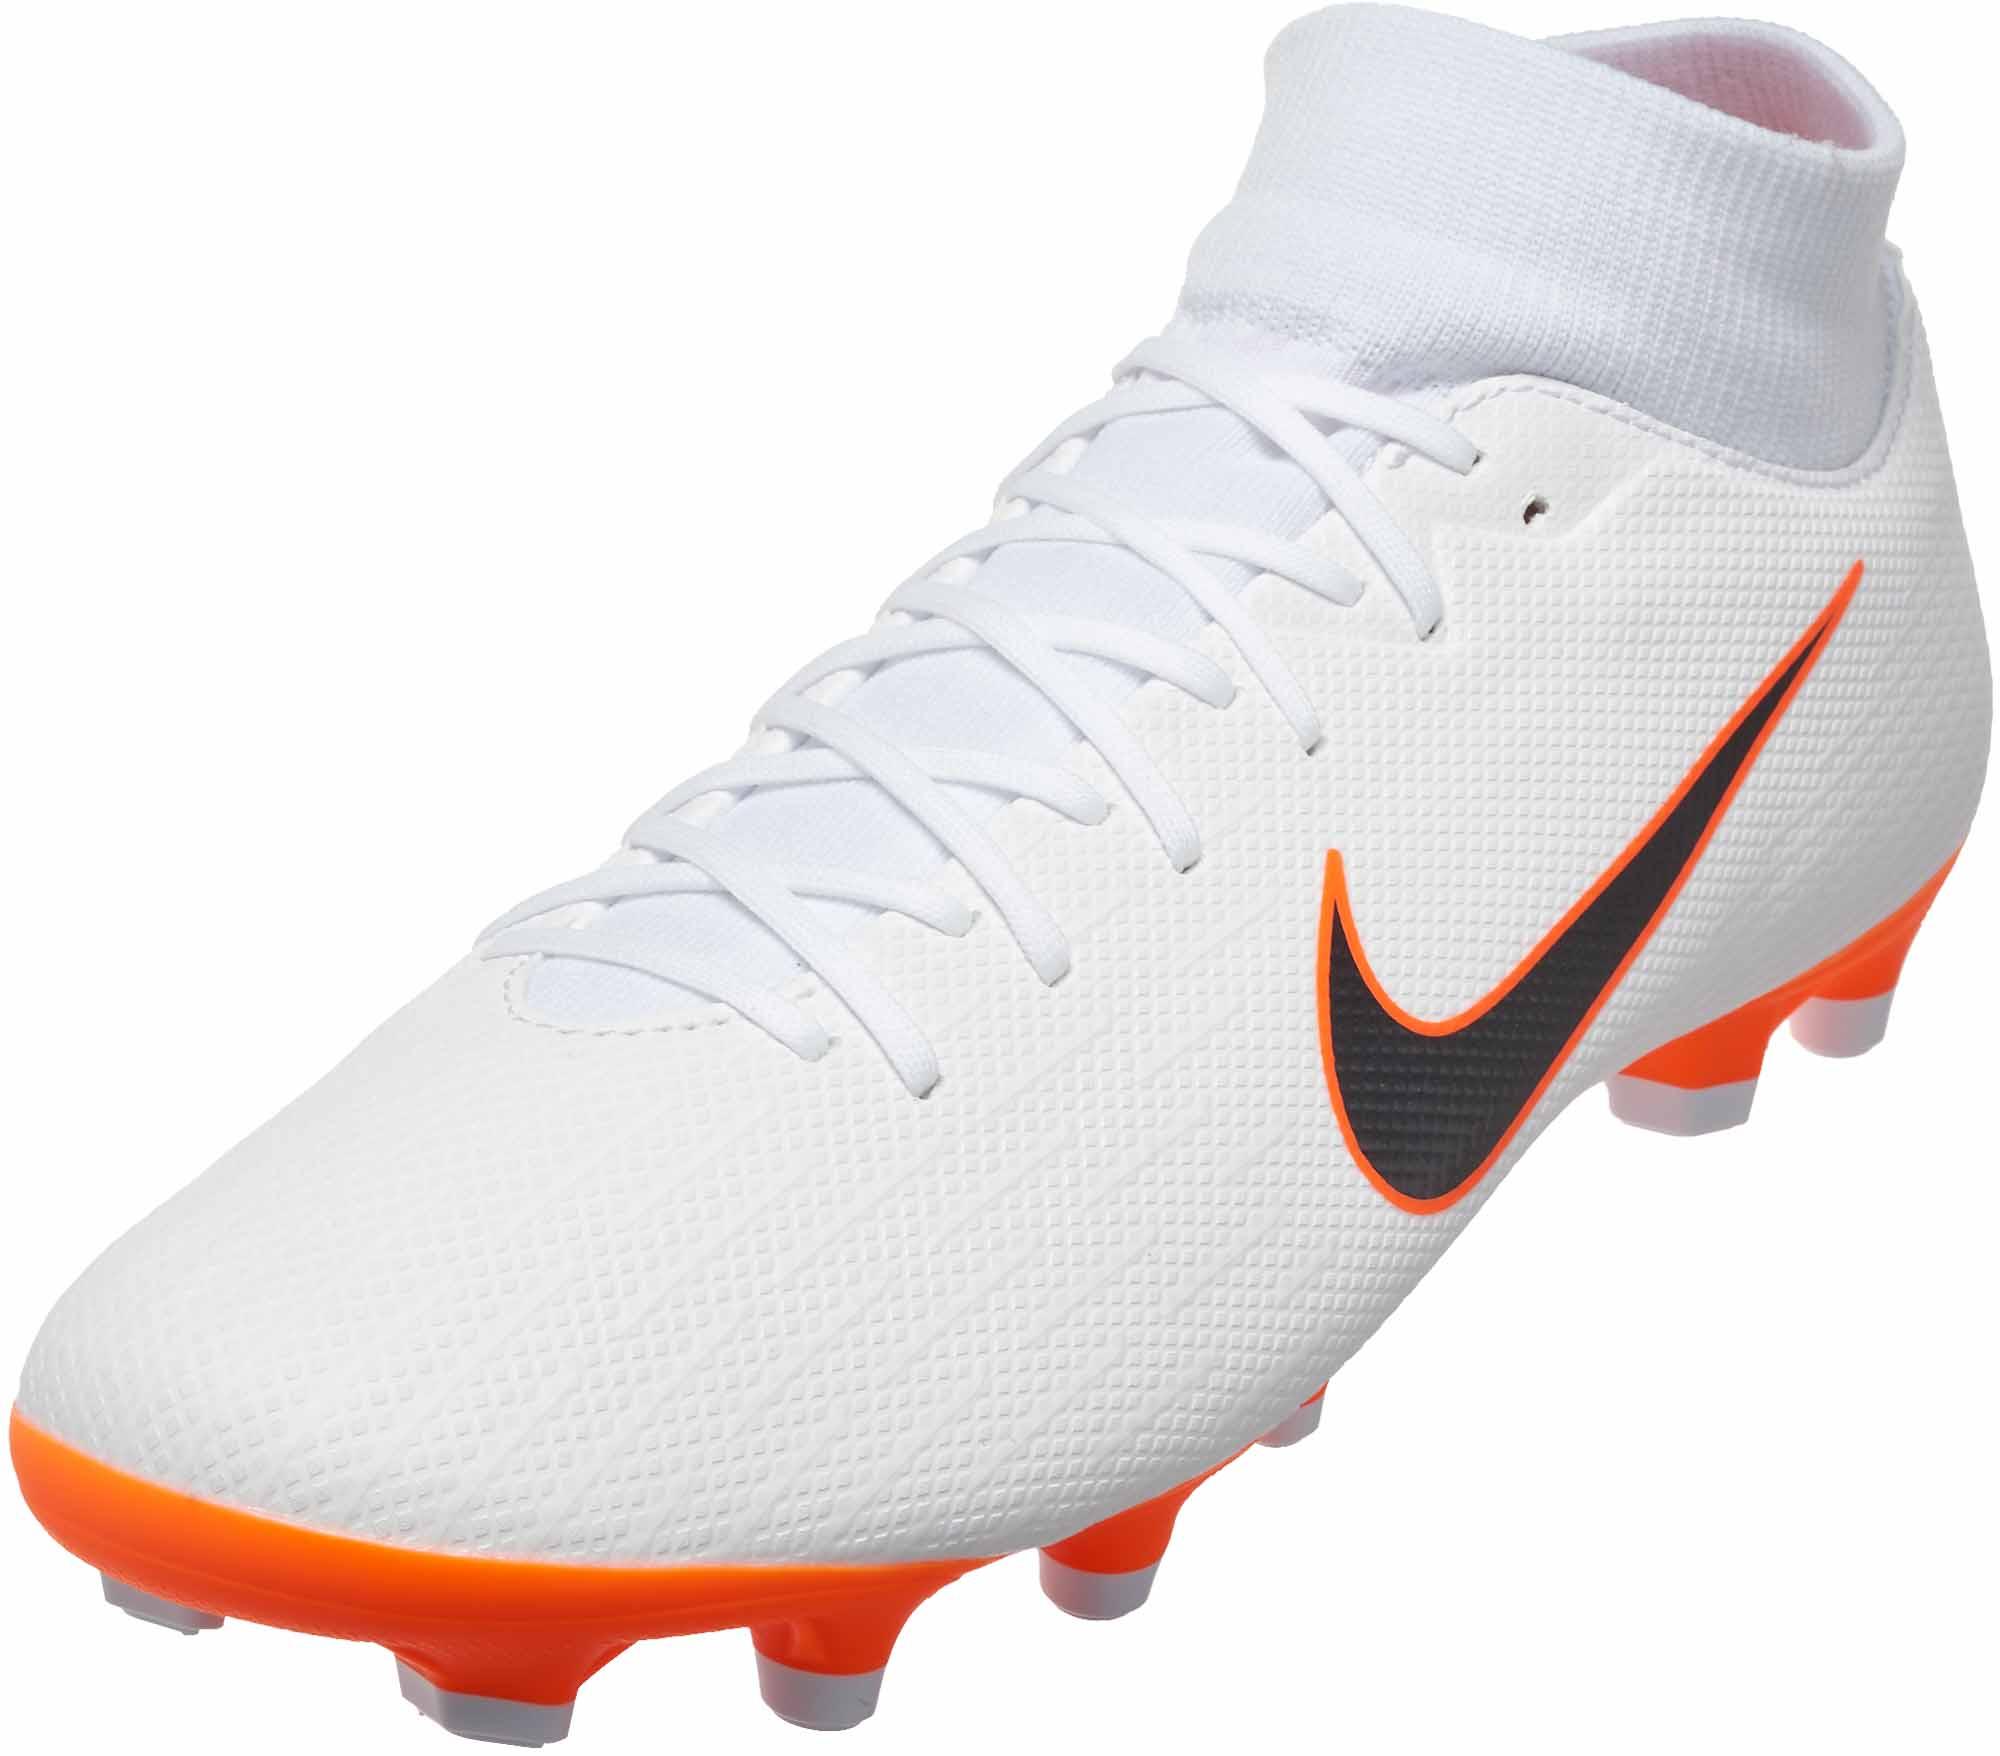 64114f9e7b5f Nike Superfly 6 Academy MG - White/Metallic Cool Grey/Total Orange ...